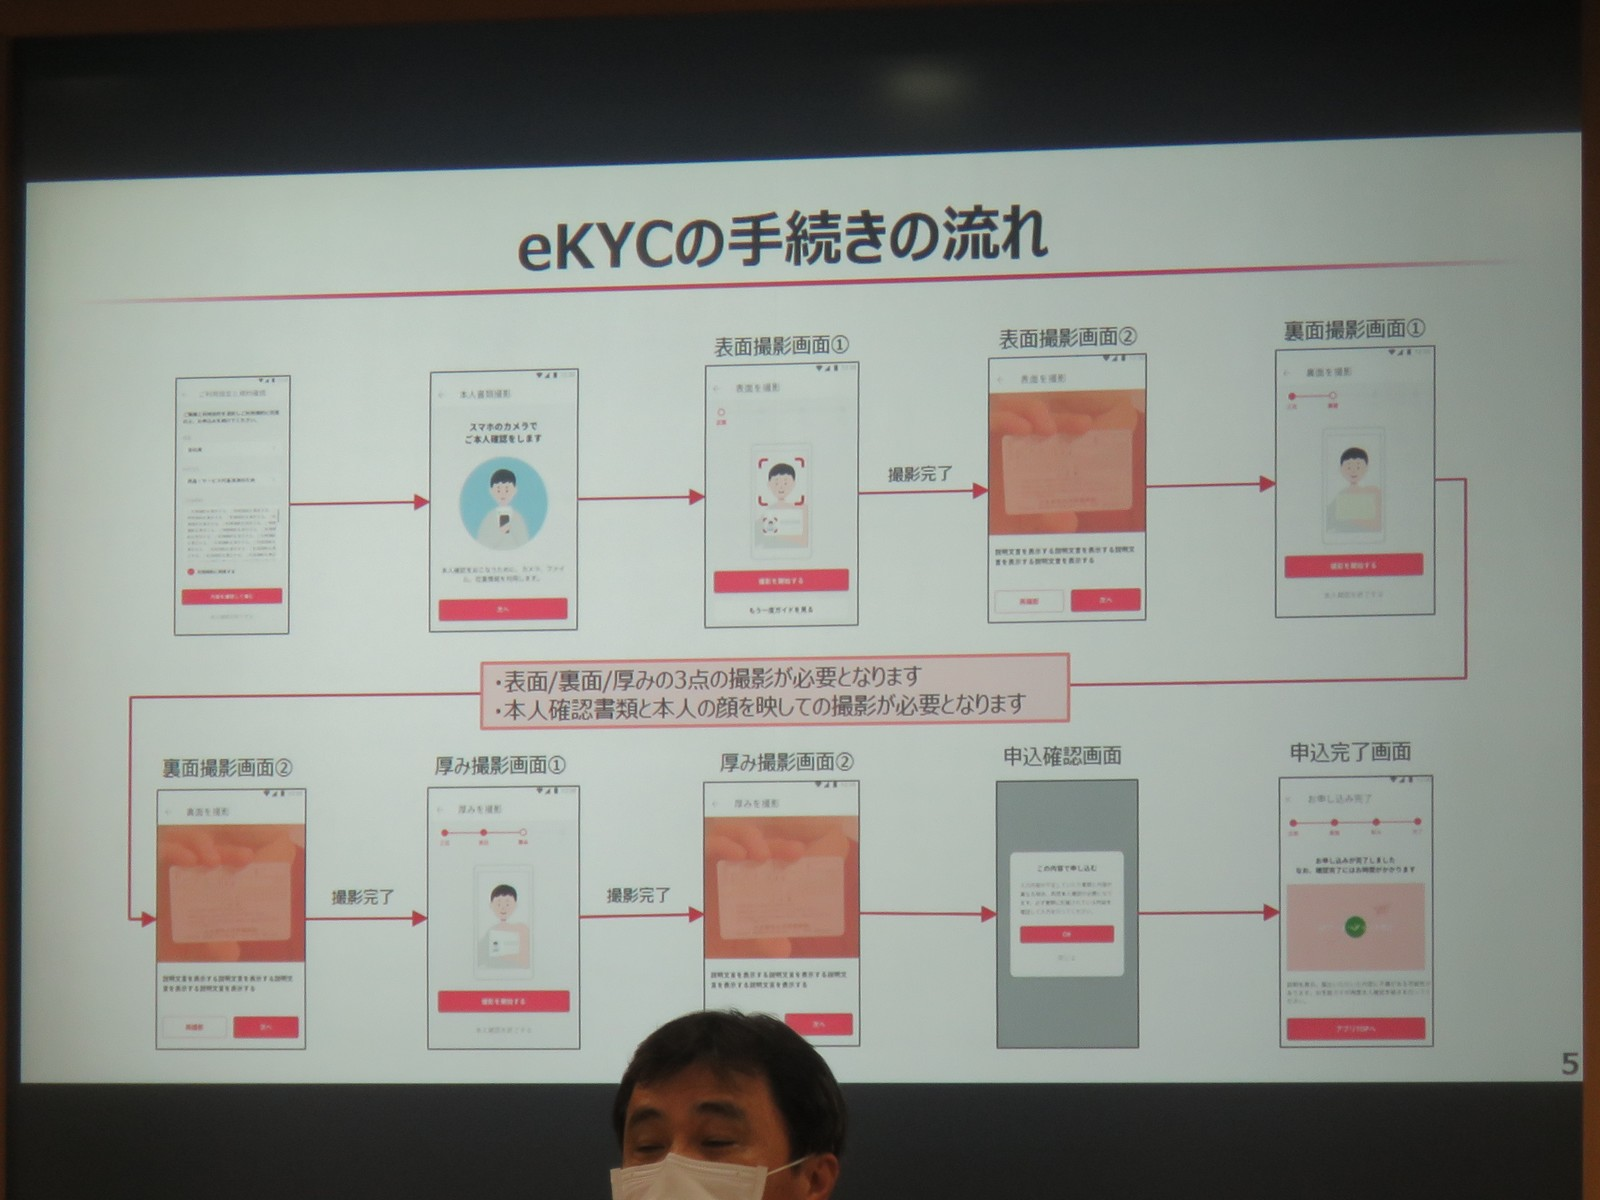 eKYCは2018年に改正された犯罪収益移転防止法に追加された「オンラインで完結する自然人の本人特定事項の確認方法」の1つで、アプリから本人画像と本人確認書類を送信するだけで良い